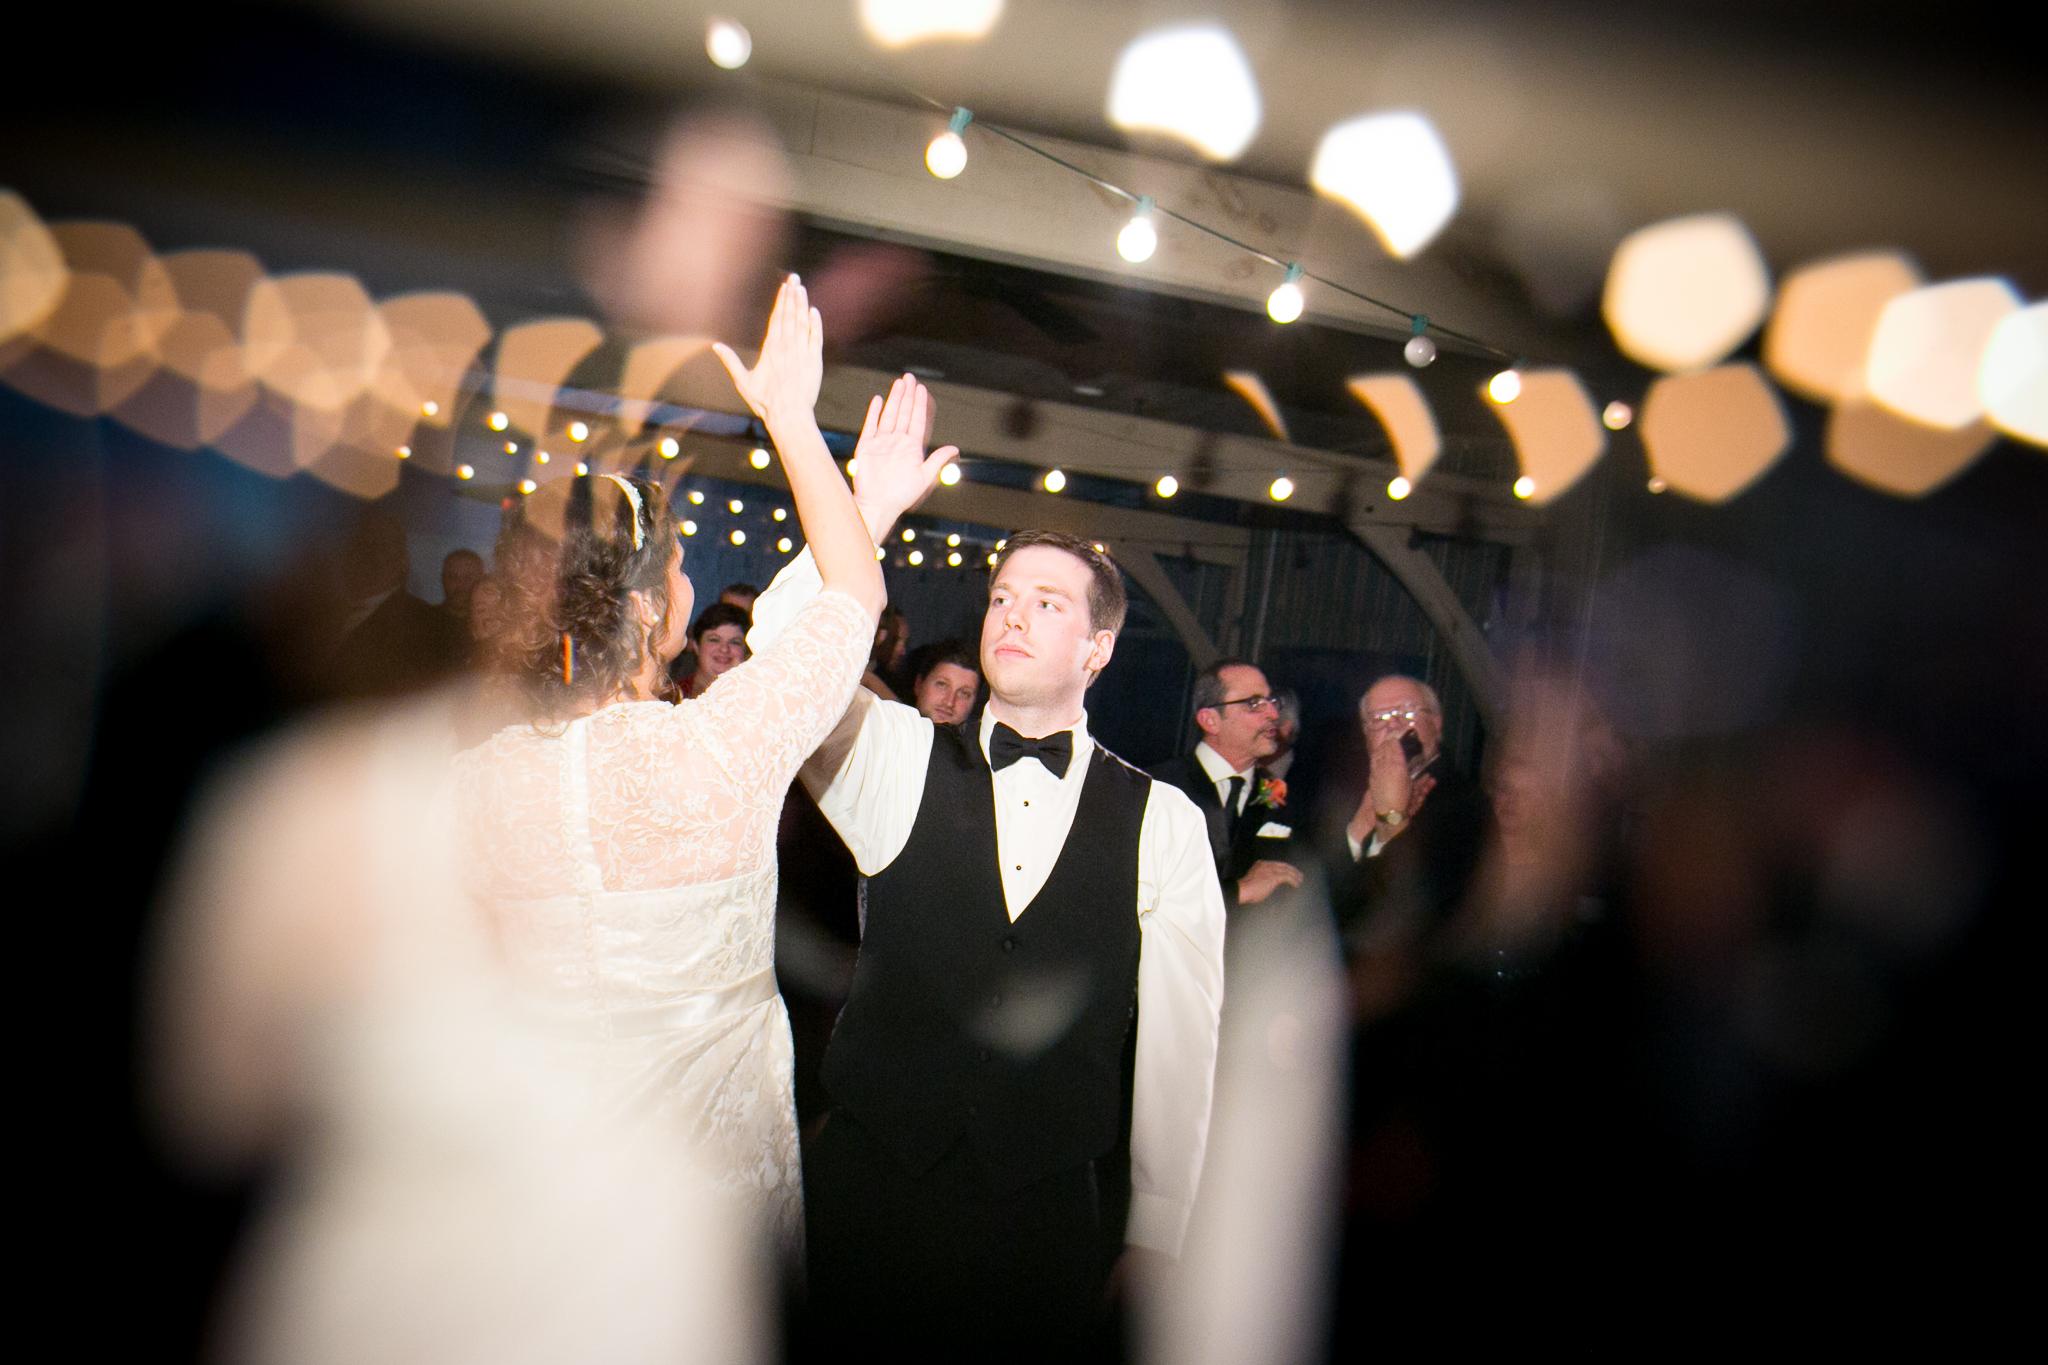 camuglia-whomstudio-chelsea_and_andy-nycphotographer-wedding-brooklyn-buffalo-timberlodge-120-5613.jpg